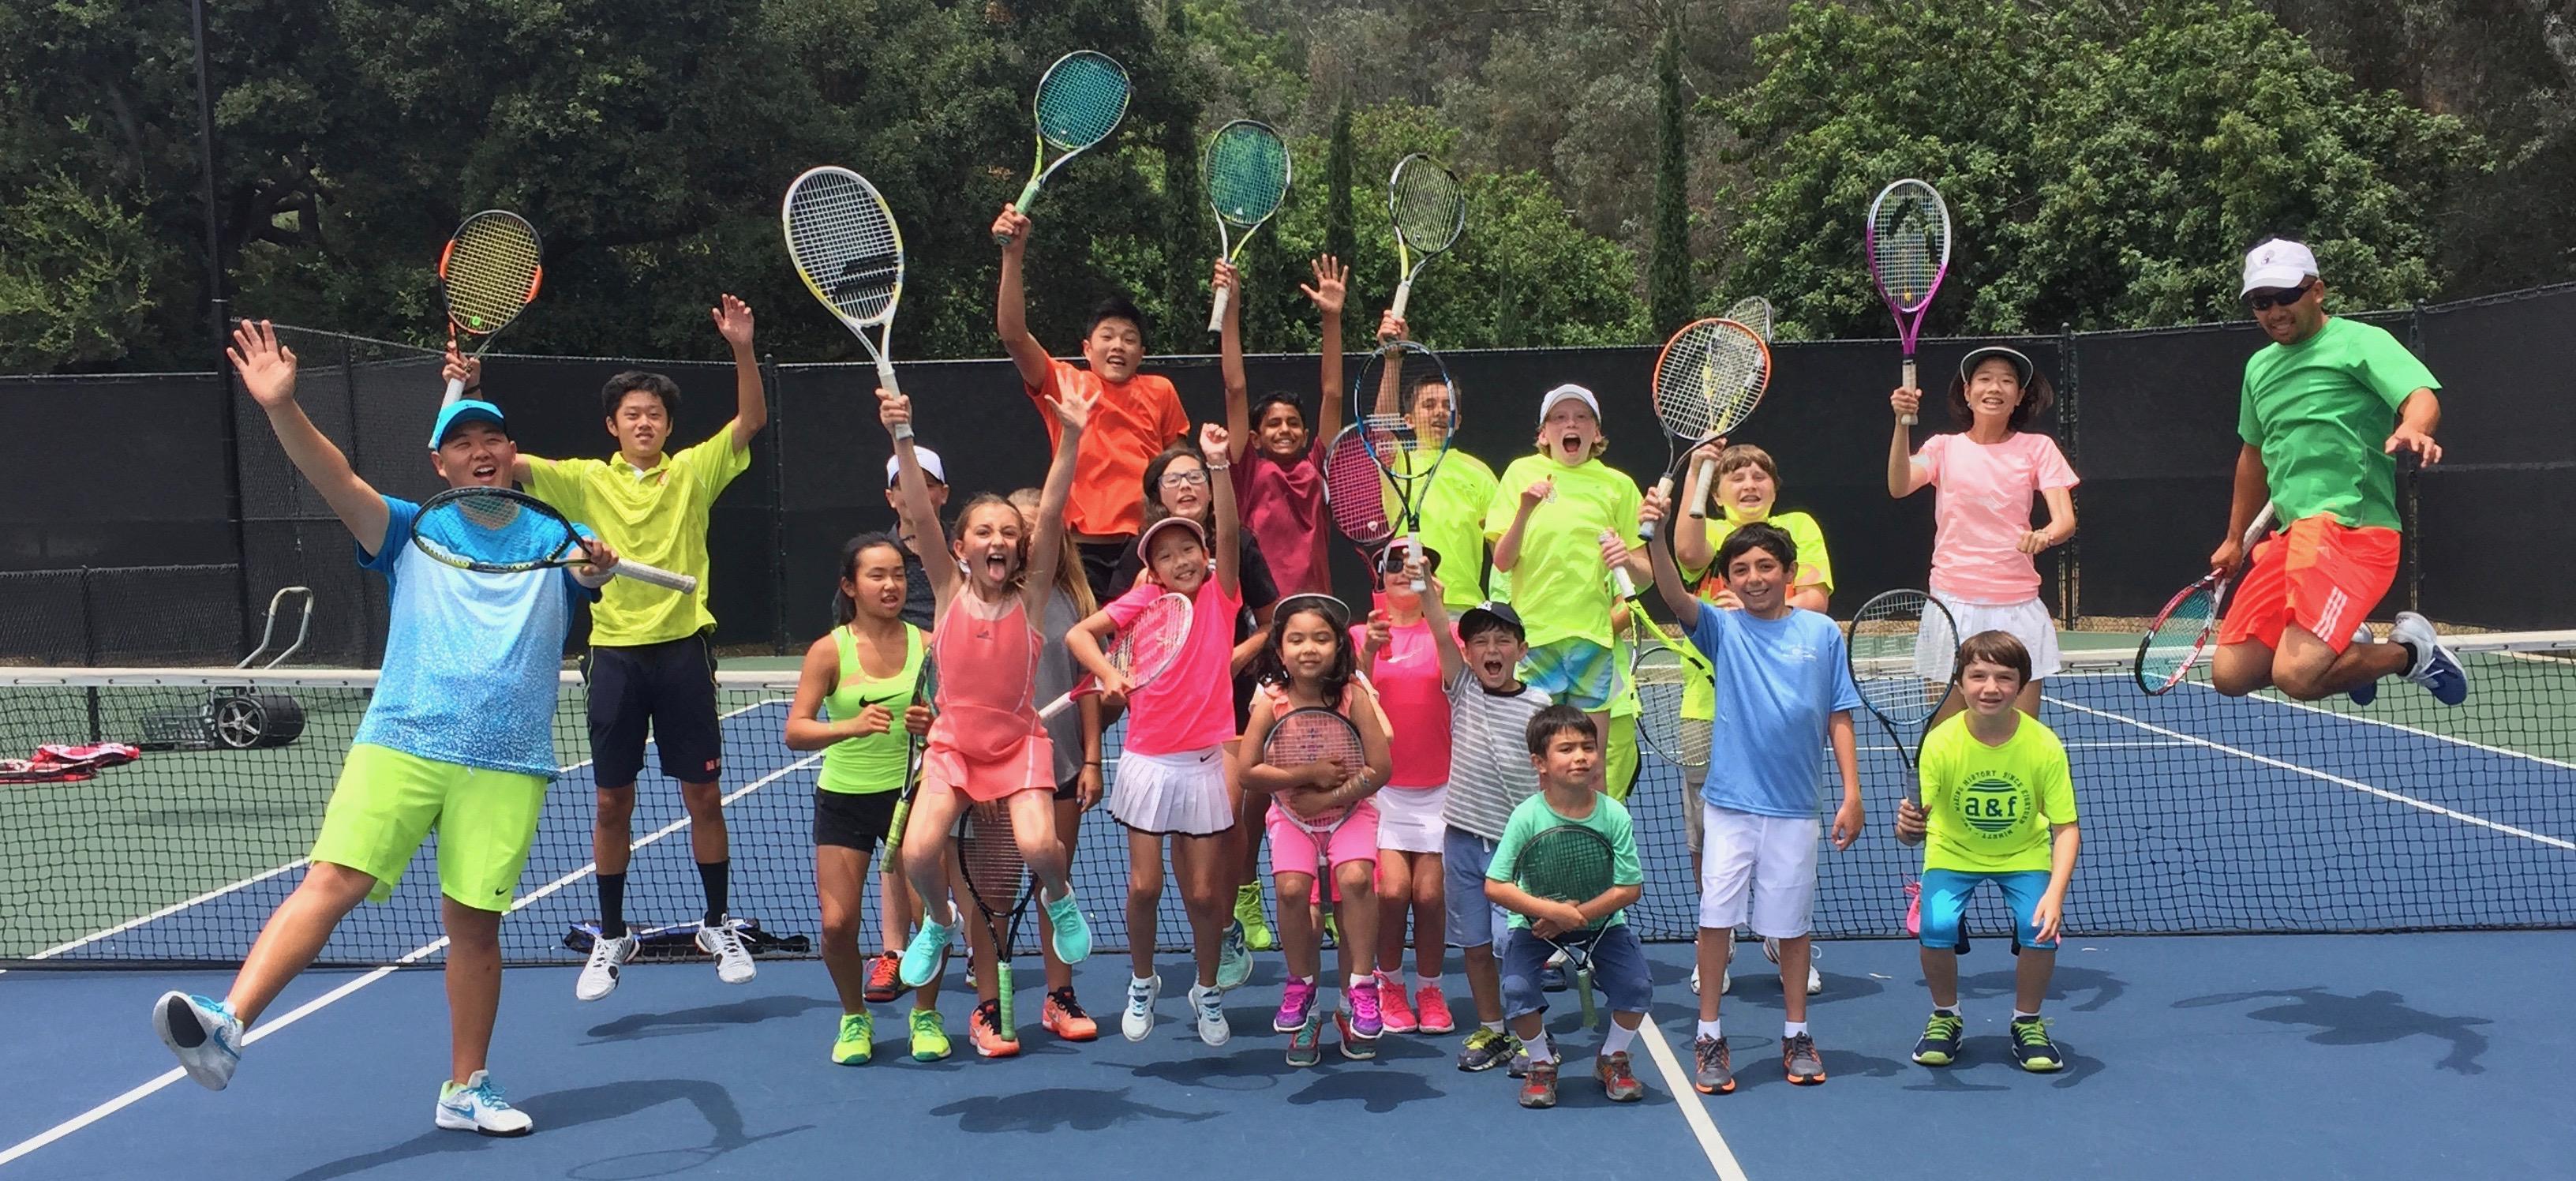 Картинки по запросу tennis summer camp